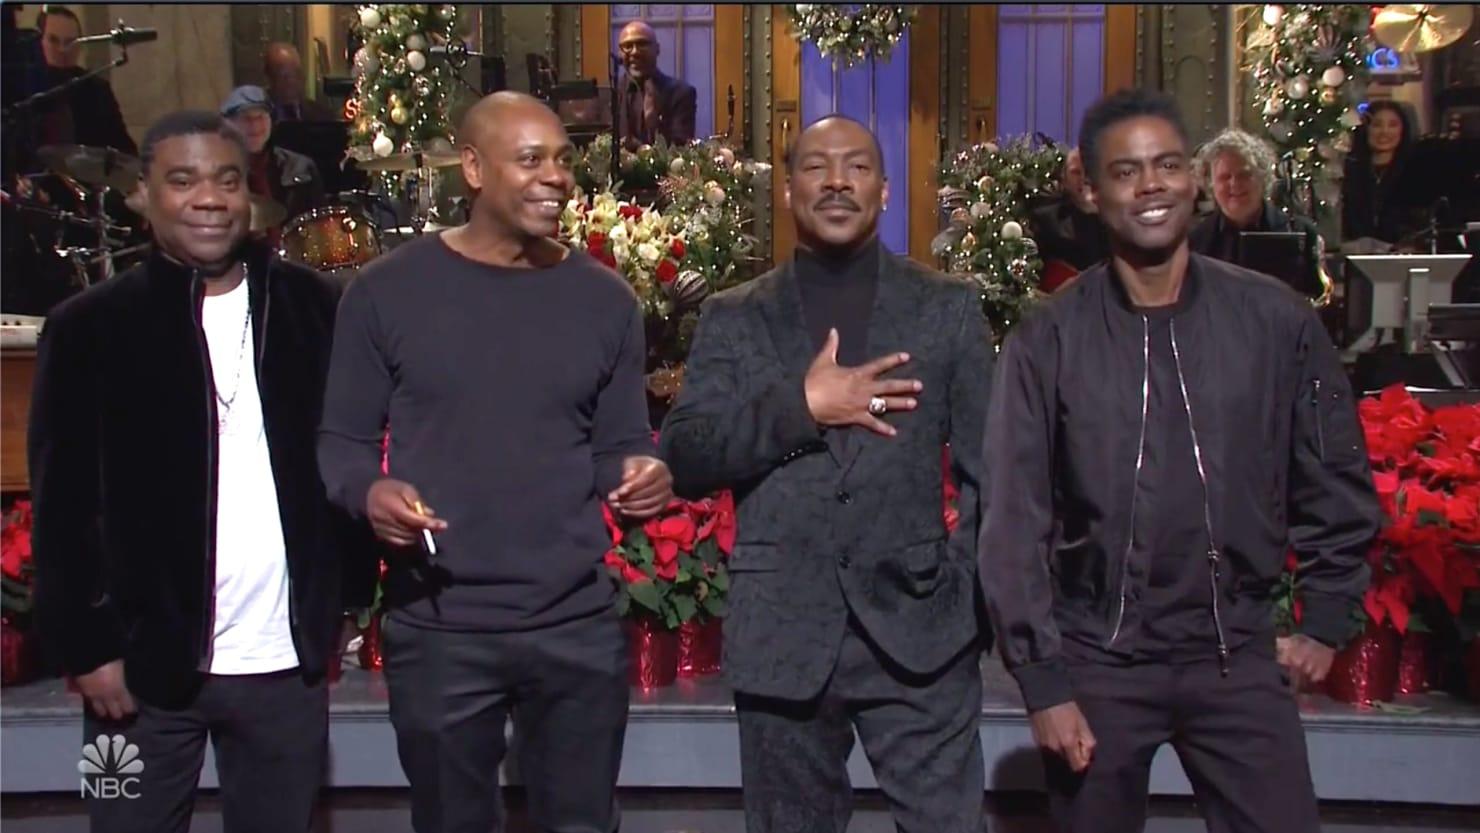 Eddie Murphy Roasts Bill Cosby in SNL Return: 'Who's America's Dad Now?'